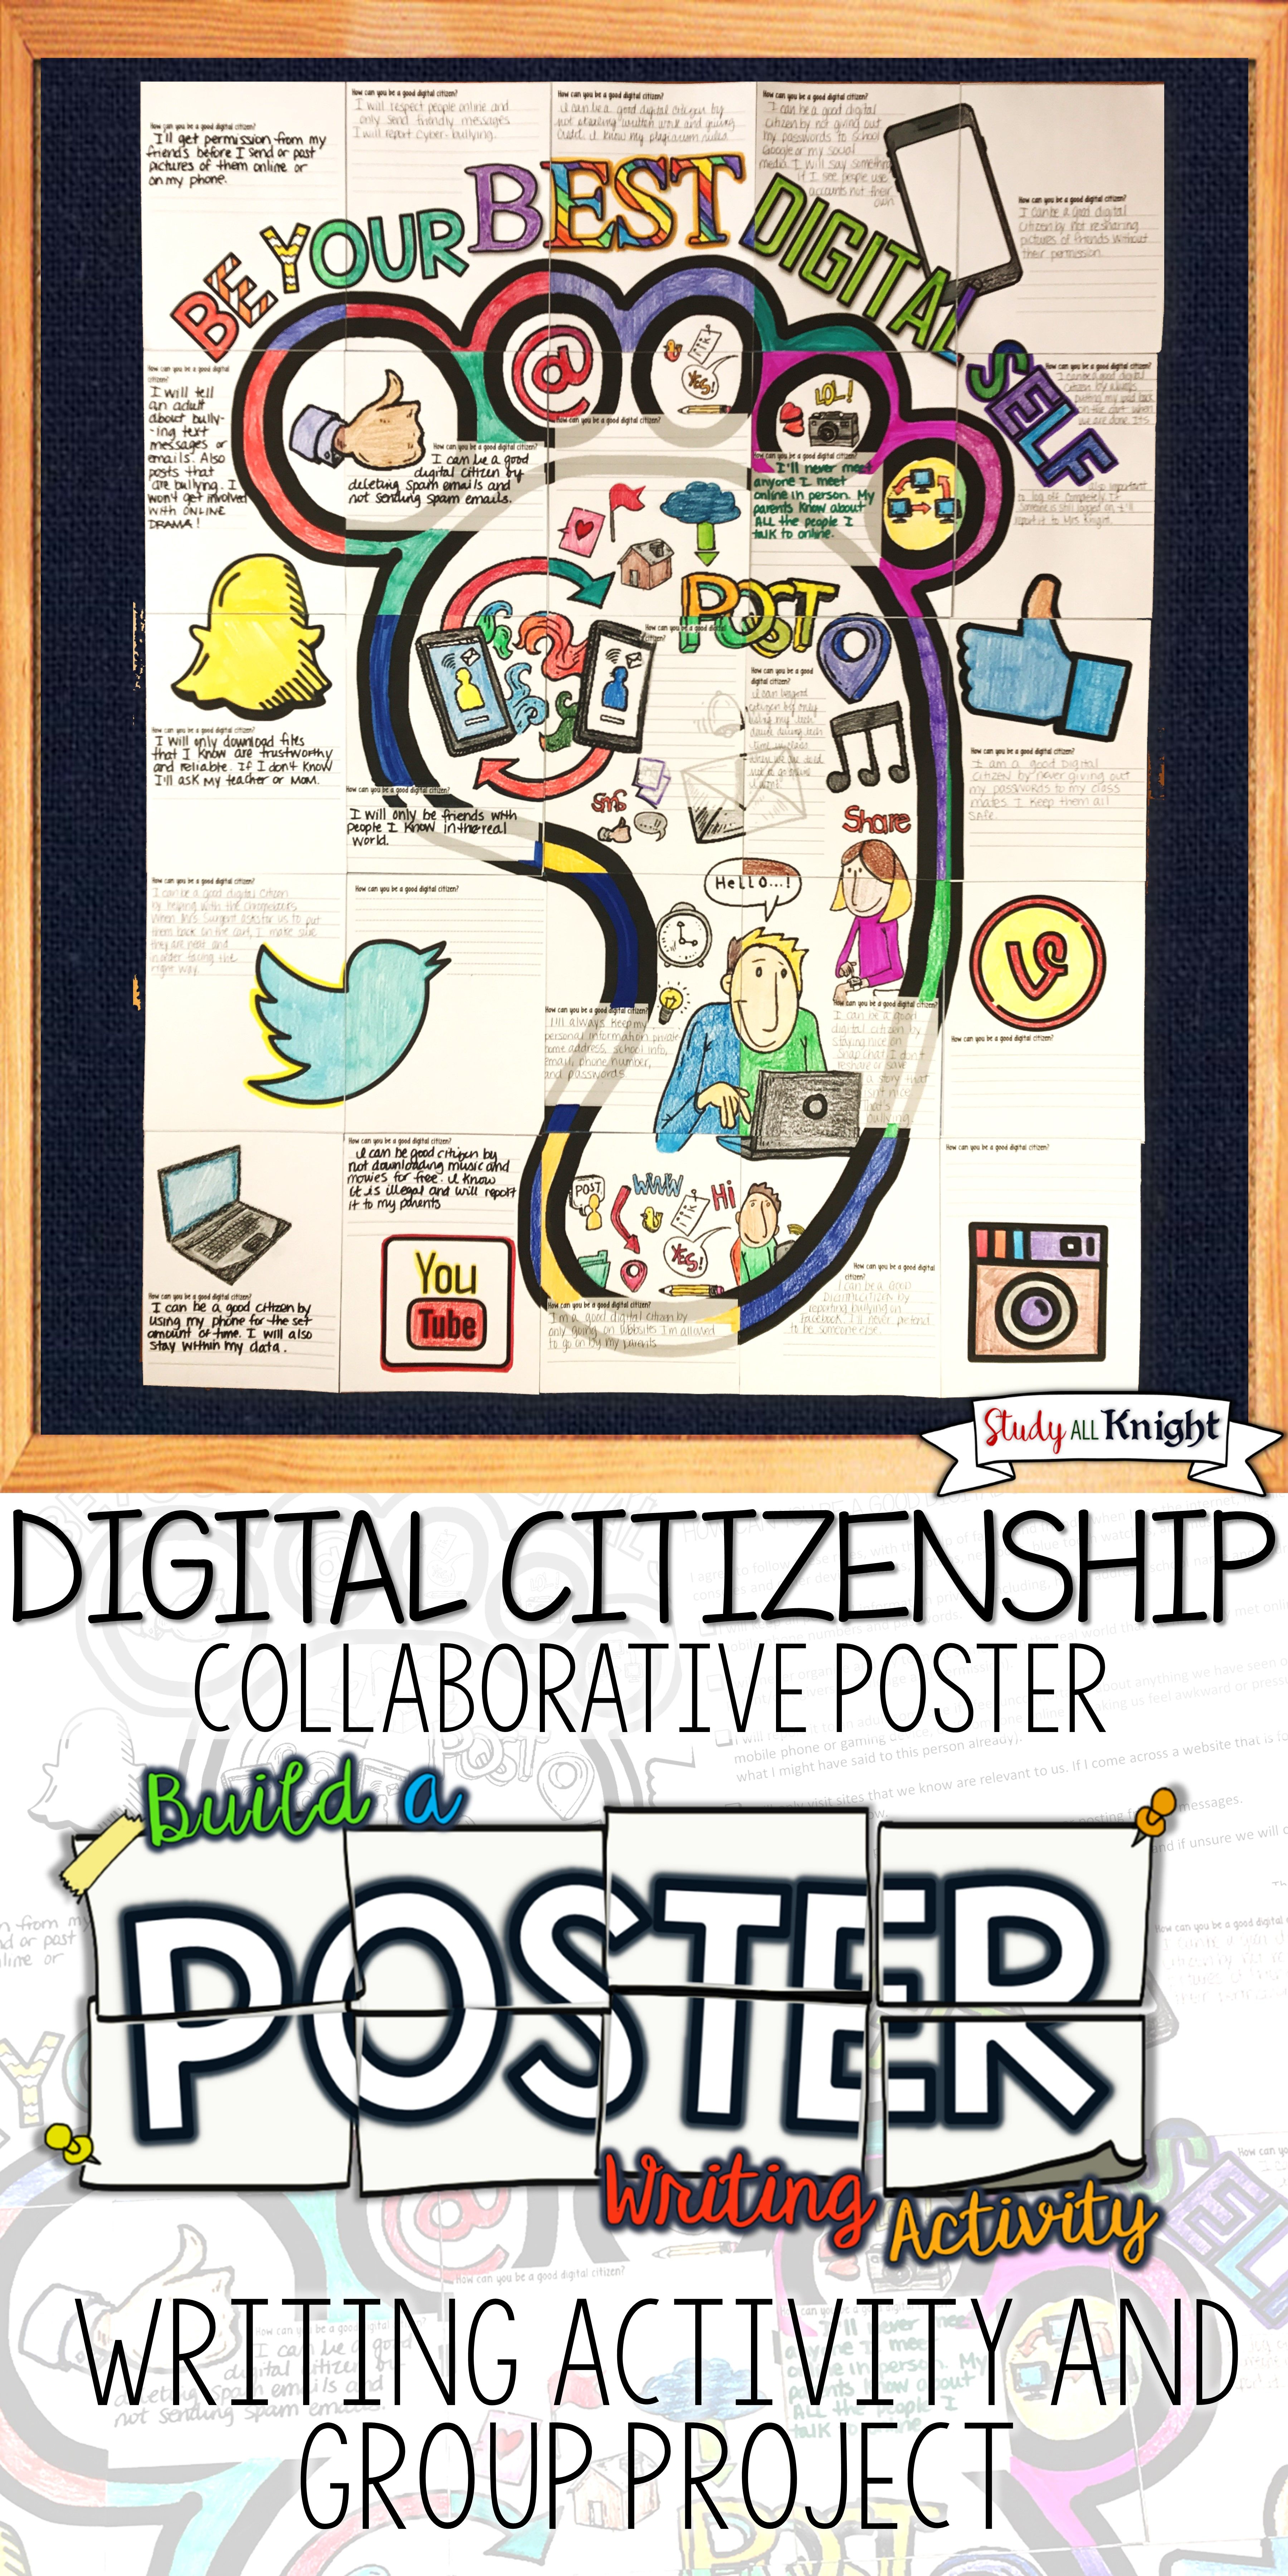 Digital Citizenship Writing Activity Poster Group